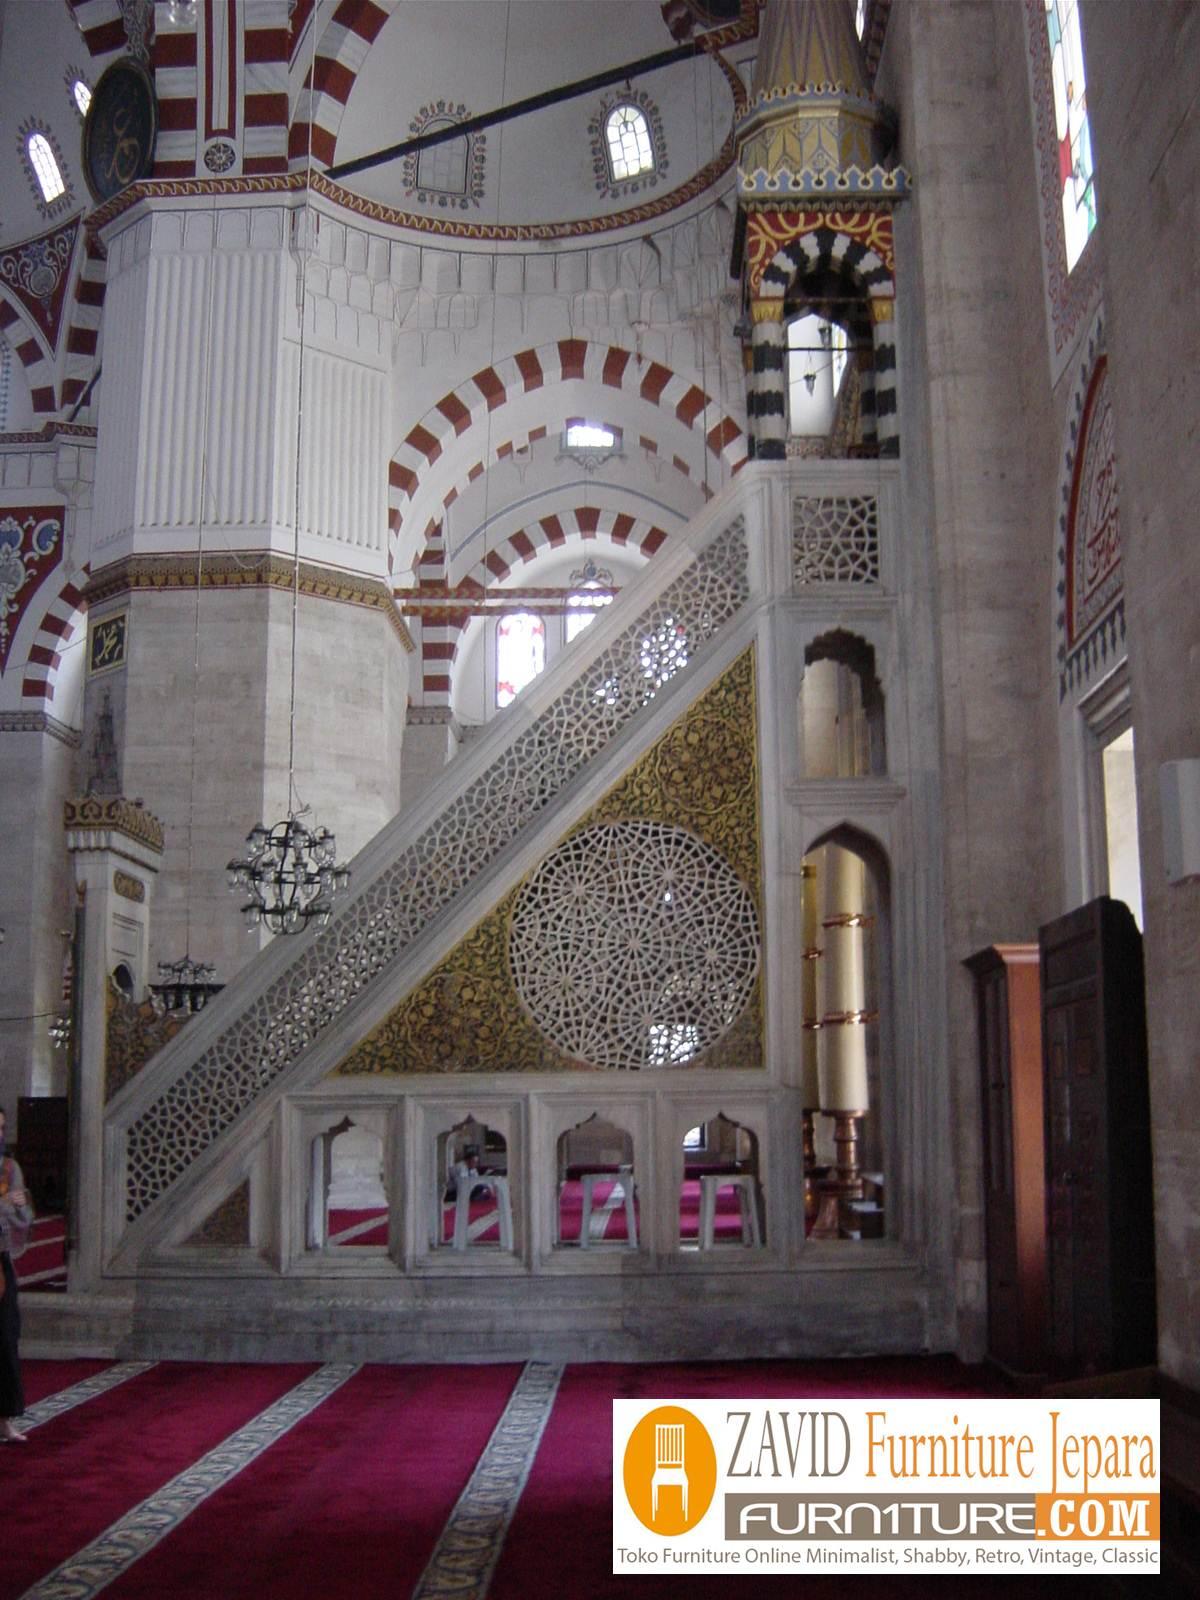 mimbar-masjid-mewah Model Gambar Mimbar Masjid Nabawi Madinah Yang Terkenal